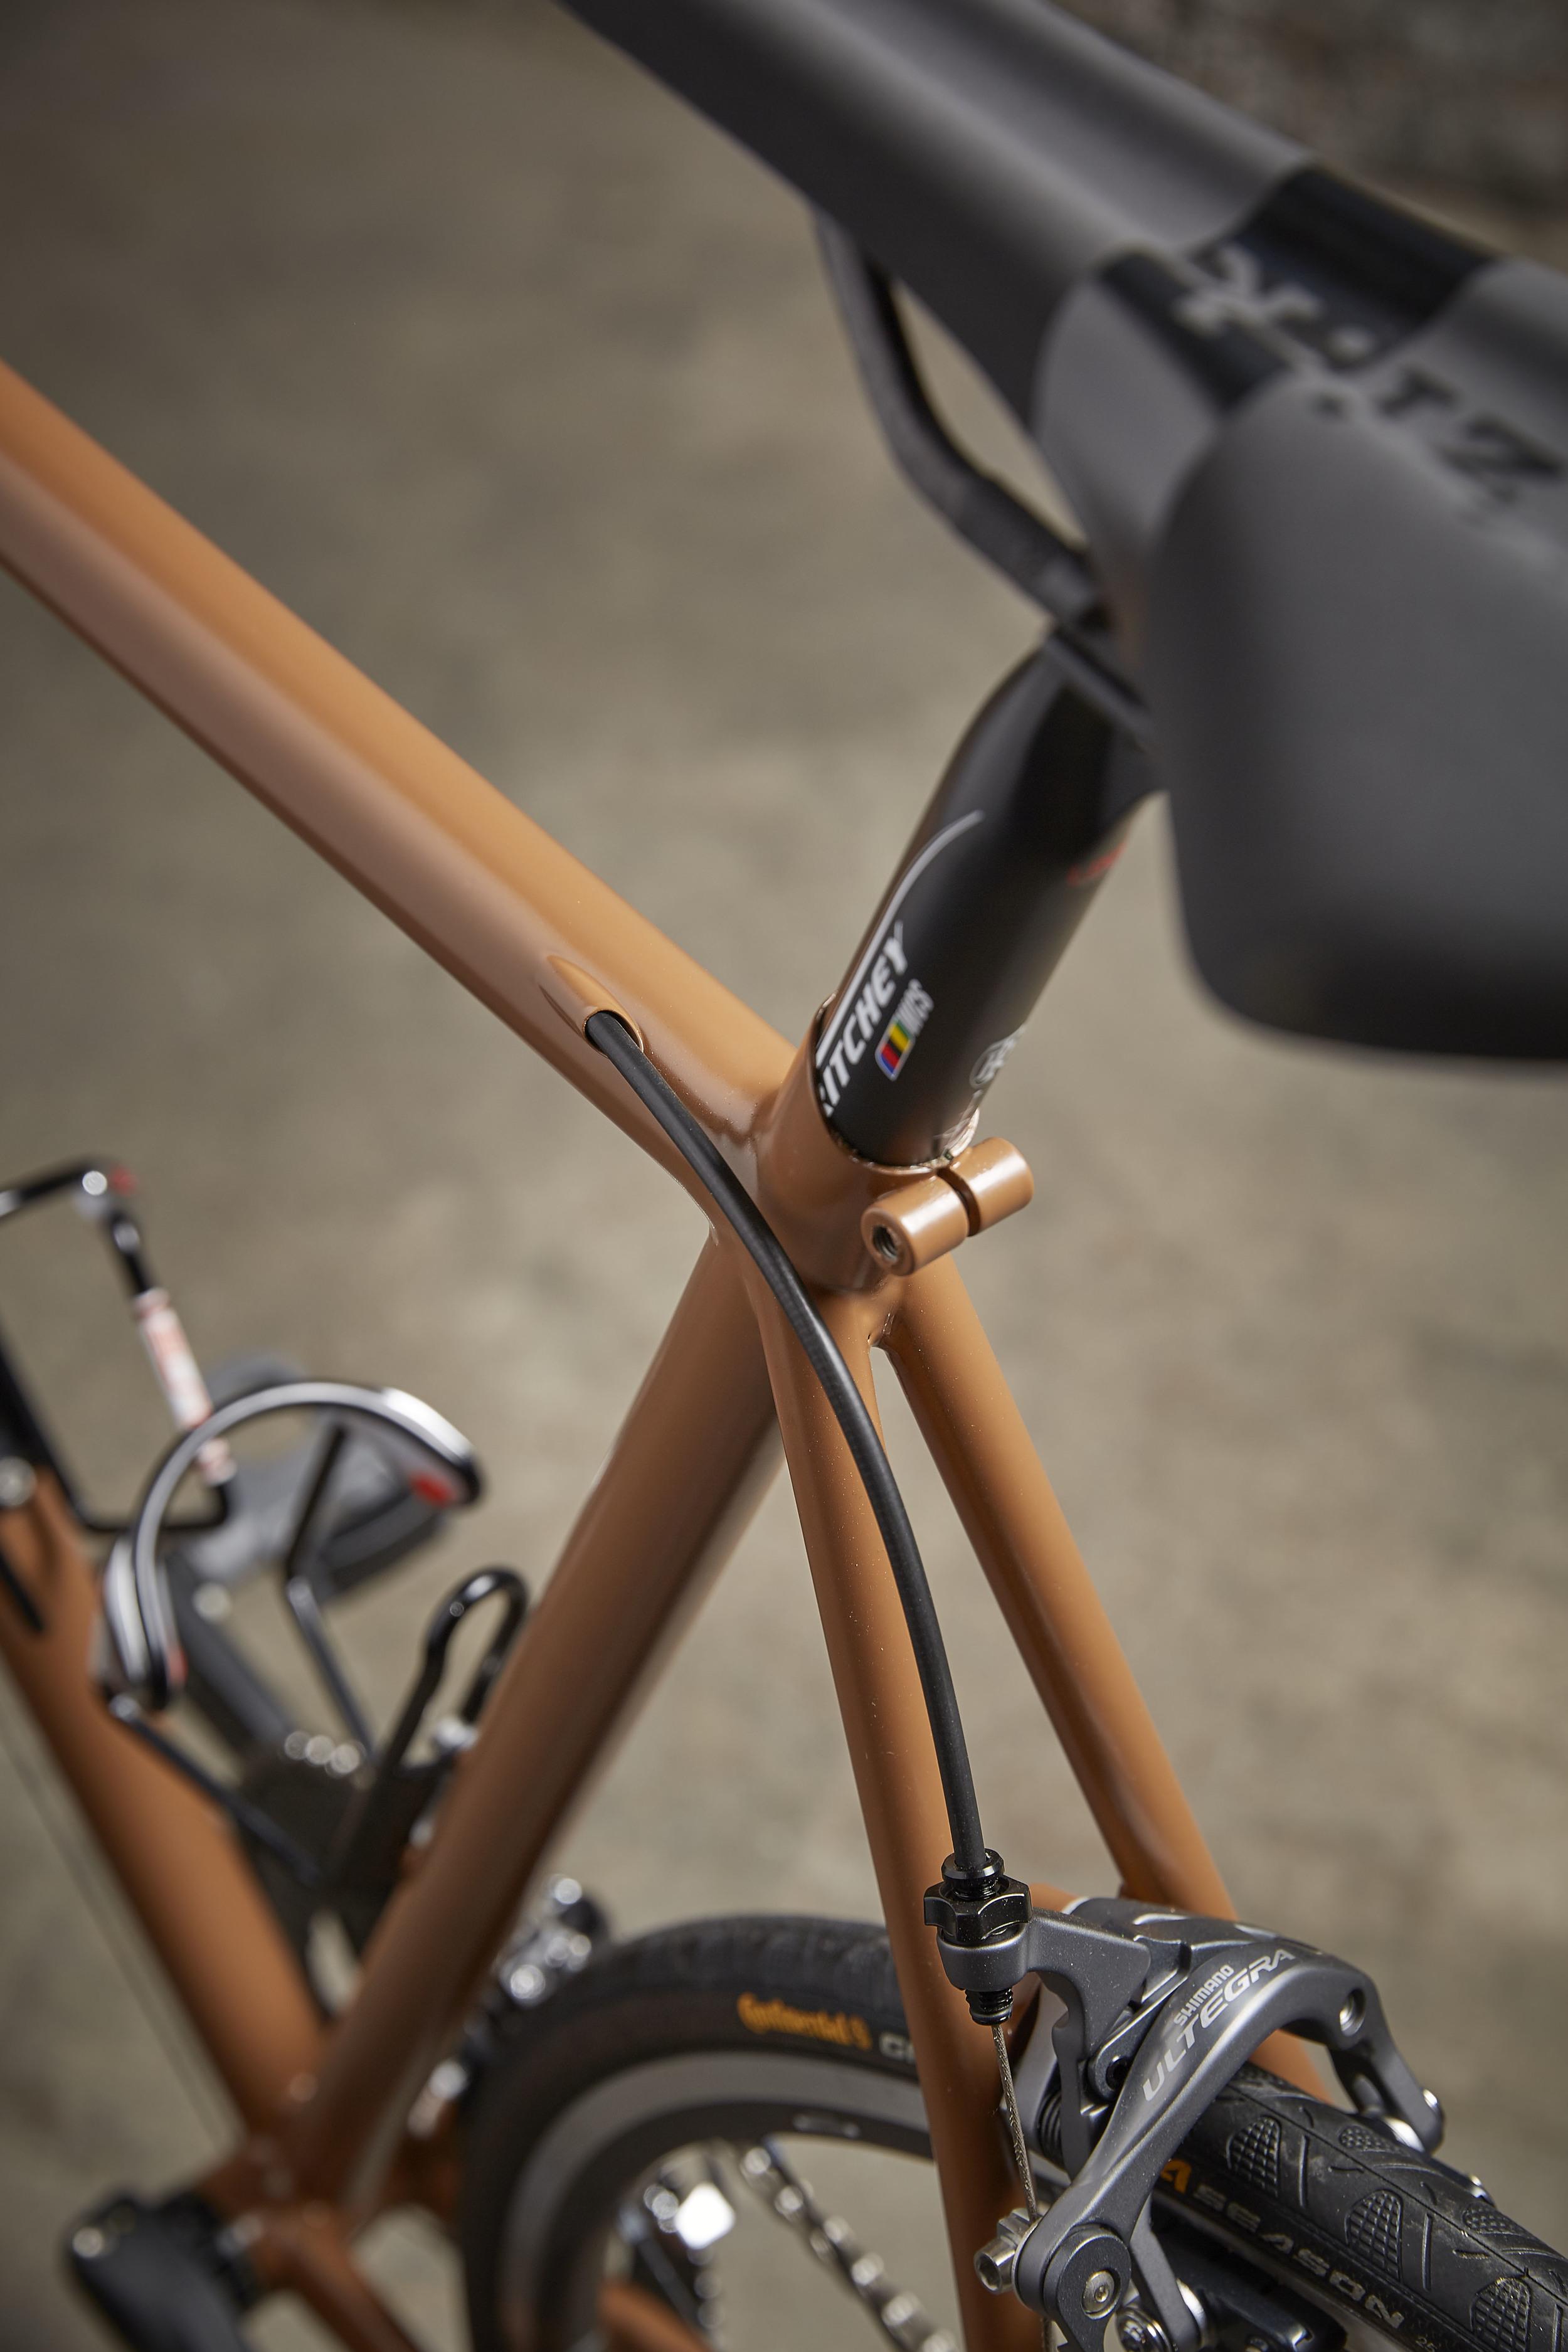 0010 Roadbike Internal Cable Out.jpg